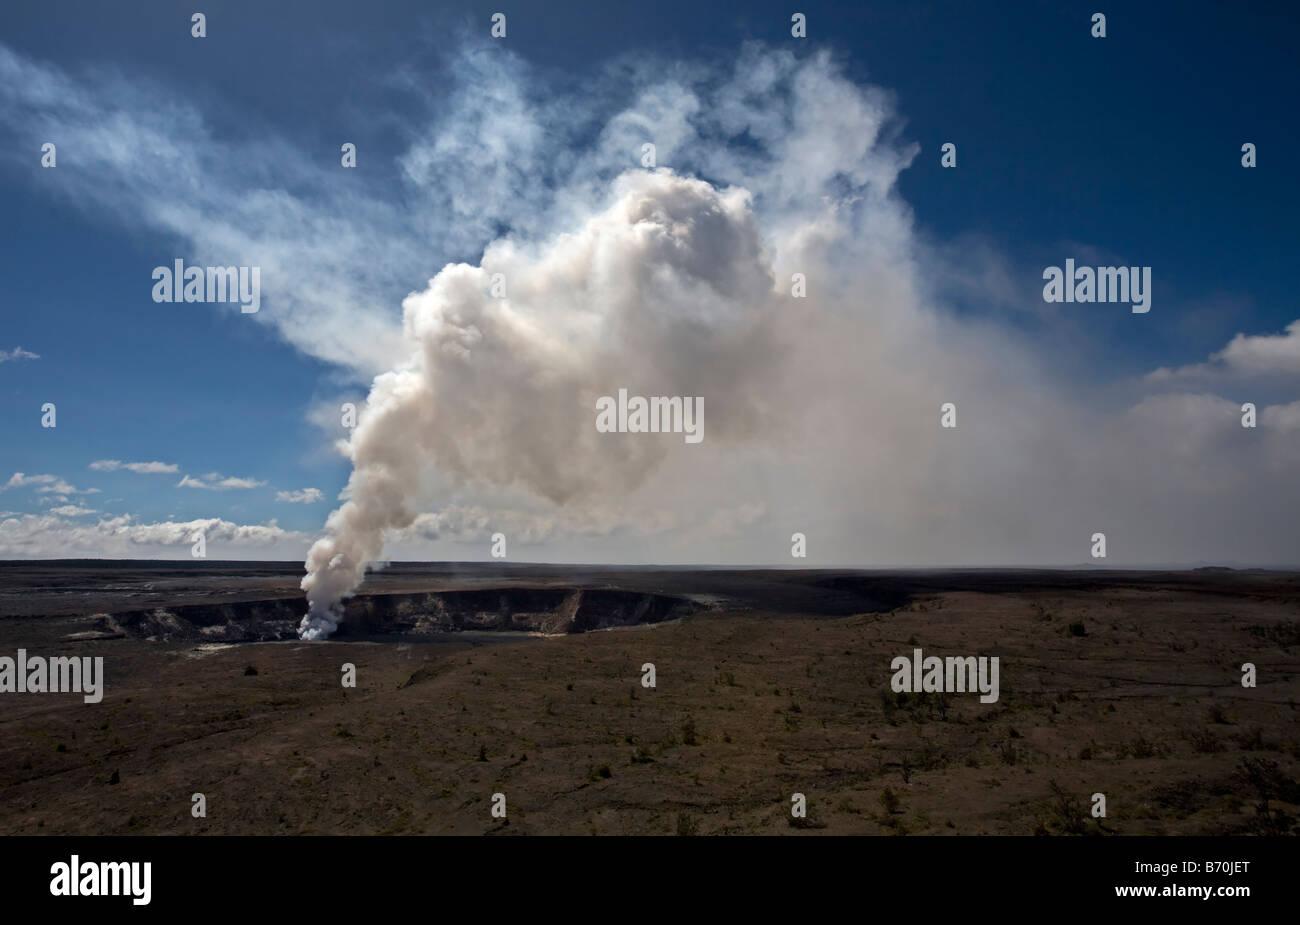 Smoke and gas pouring from Halema'uma'u caldera, Kilauea volcano, Big Island, Hawaii - Stock Image